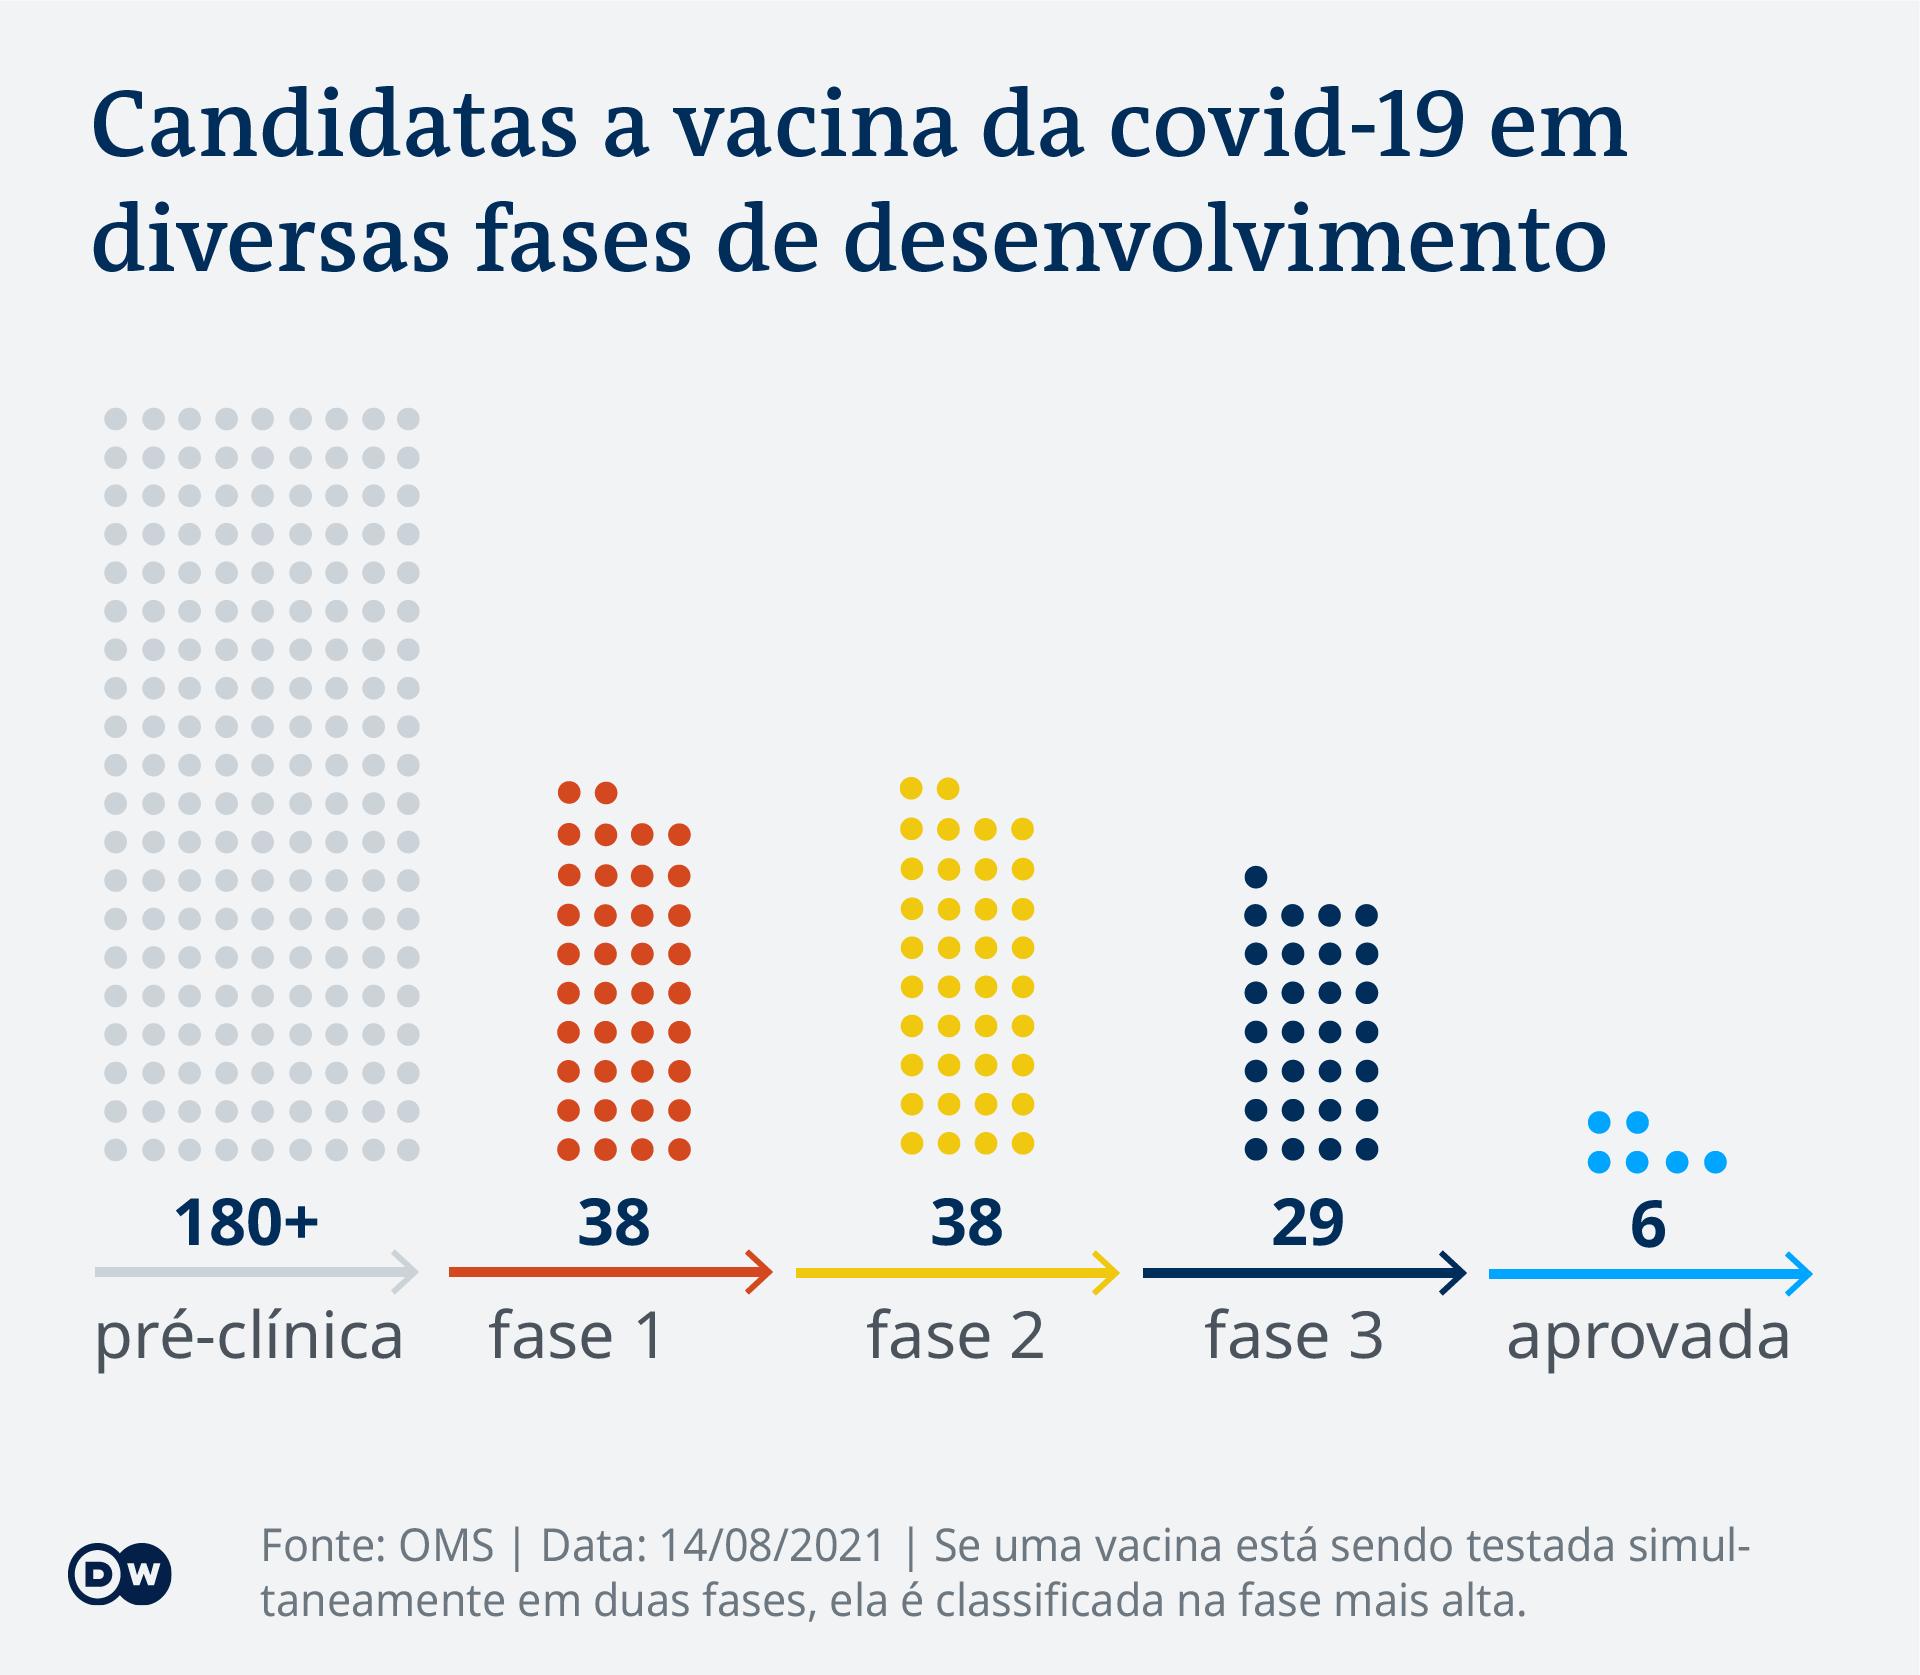 Data visualization - COVID-19 vaccination tracker - Phases - Update August 14, 2021 - Portuguese (Brazil)